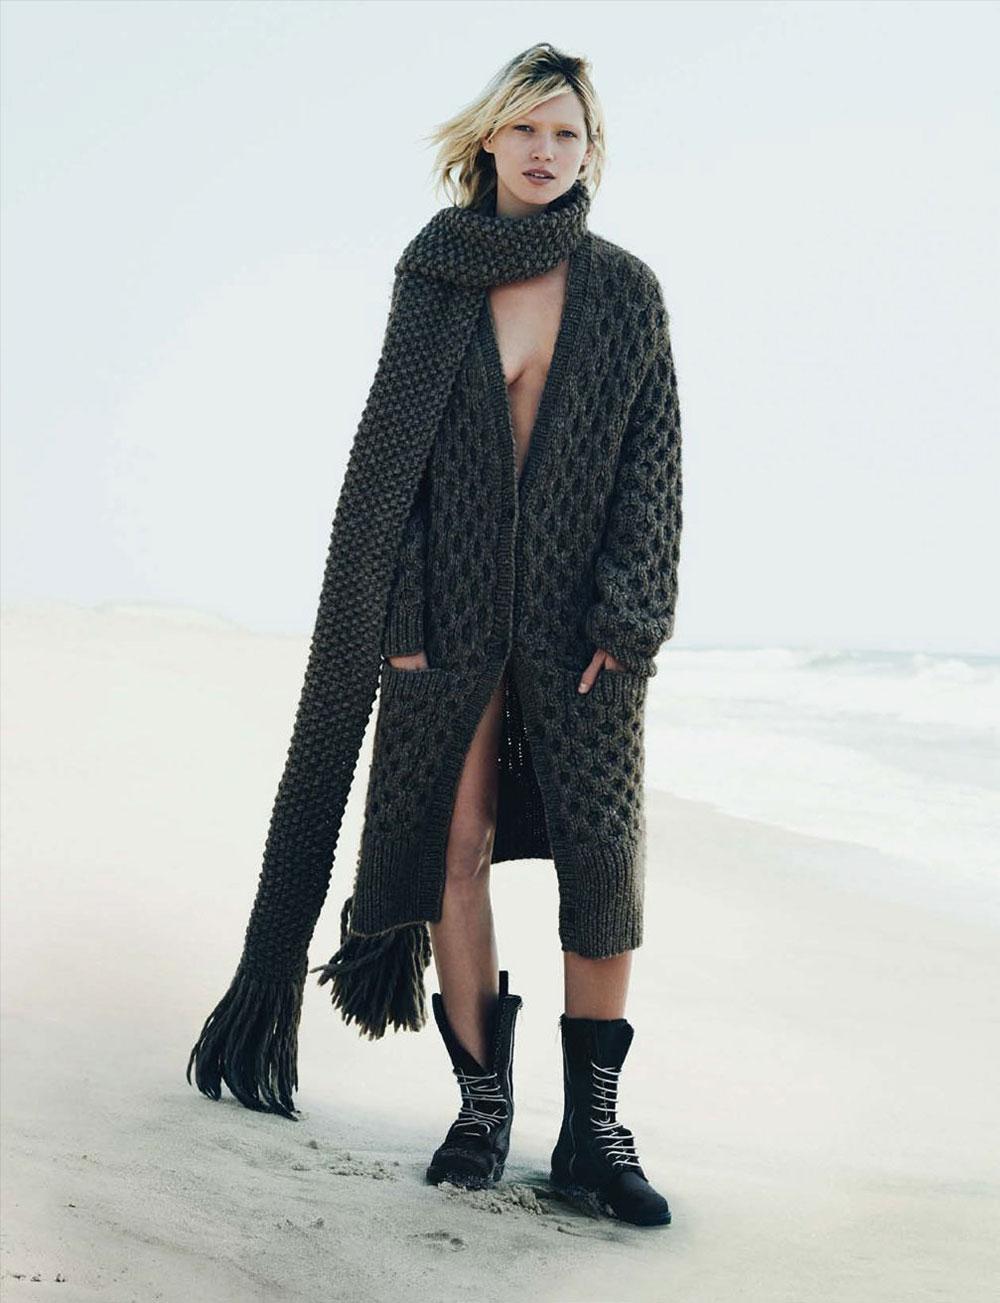 Hana, Jirickova, Luxury, Oversized, Knits, Winter, Fashion, Vogue, Editorial, Magazine, Oracle, Fox